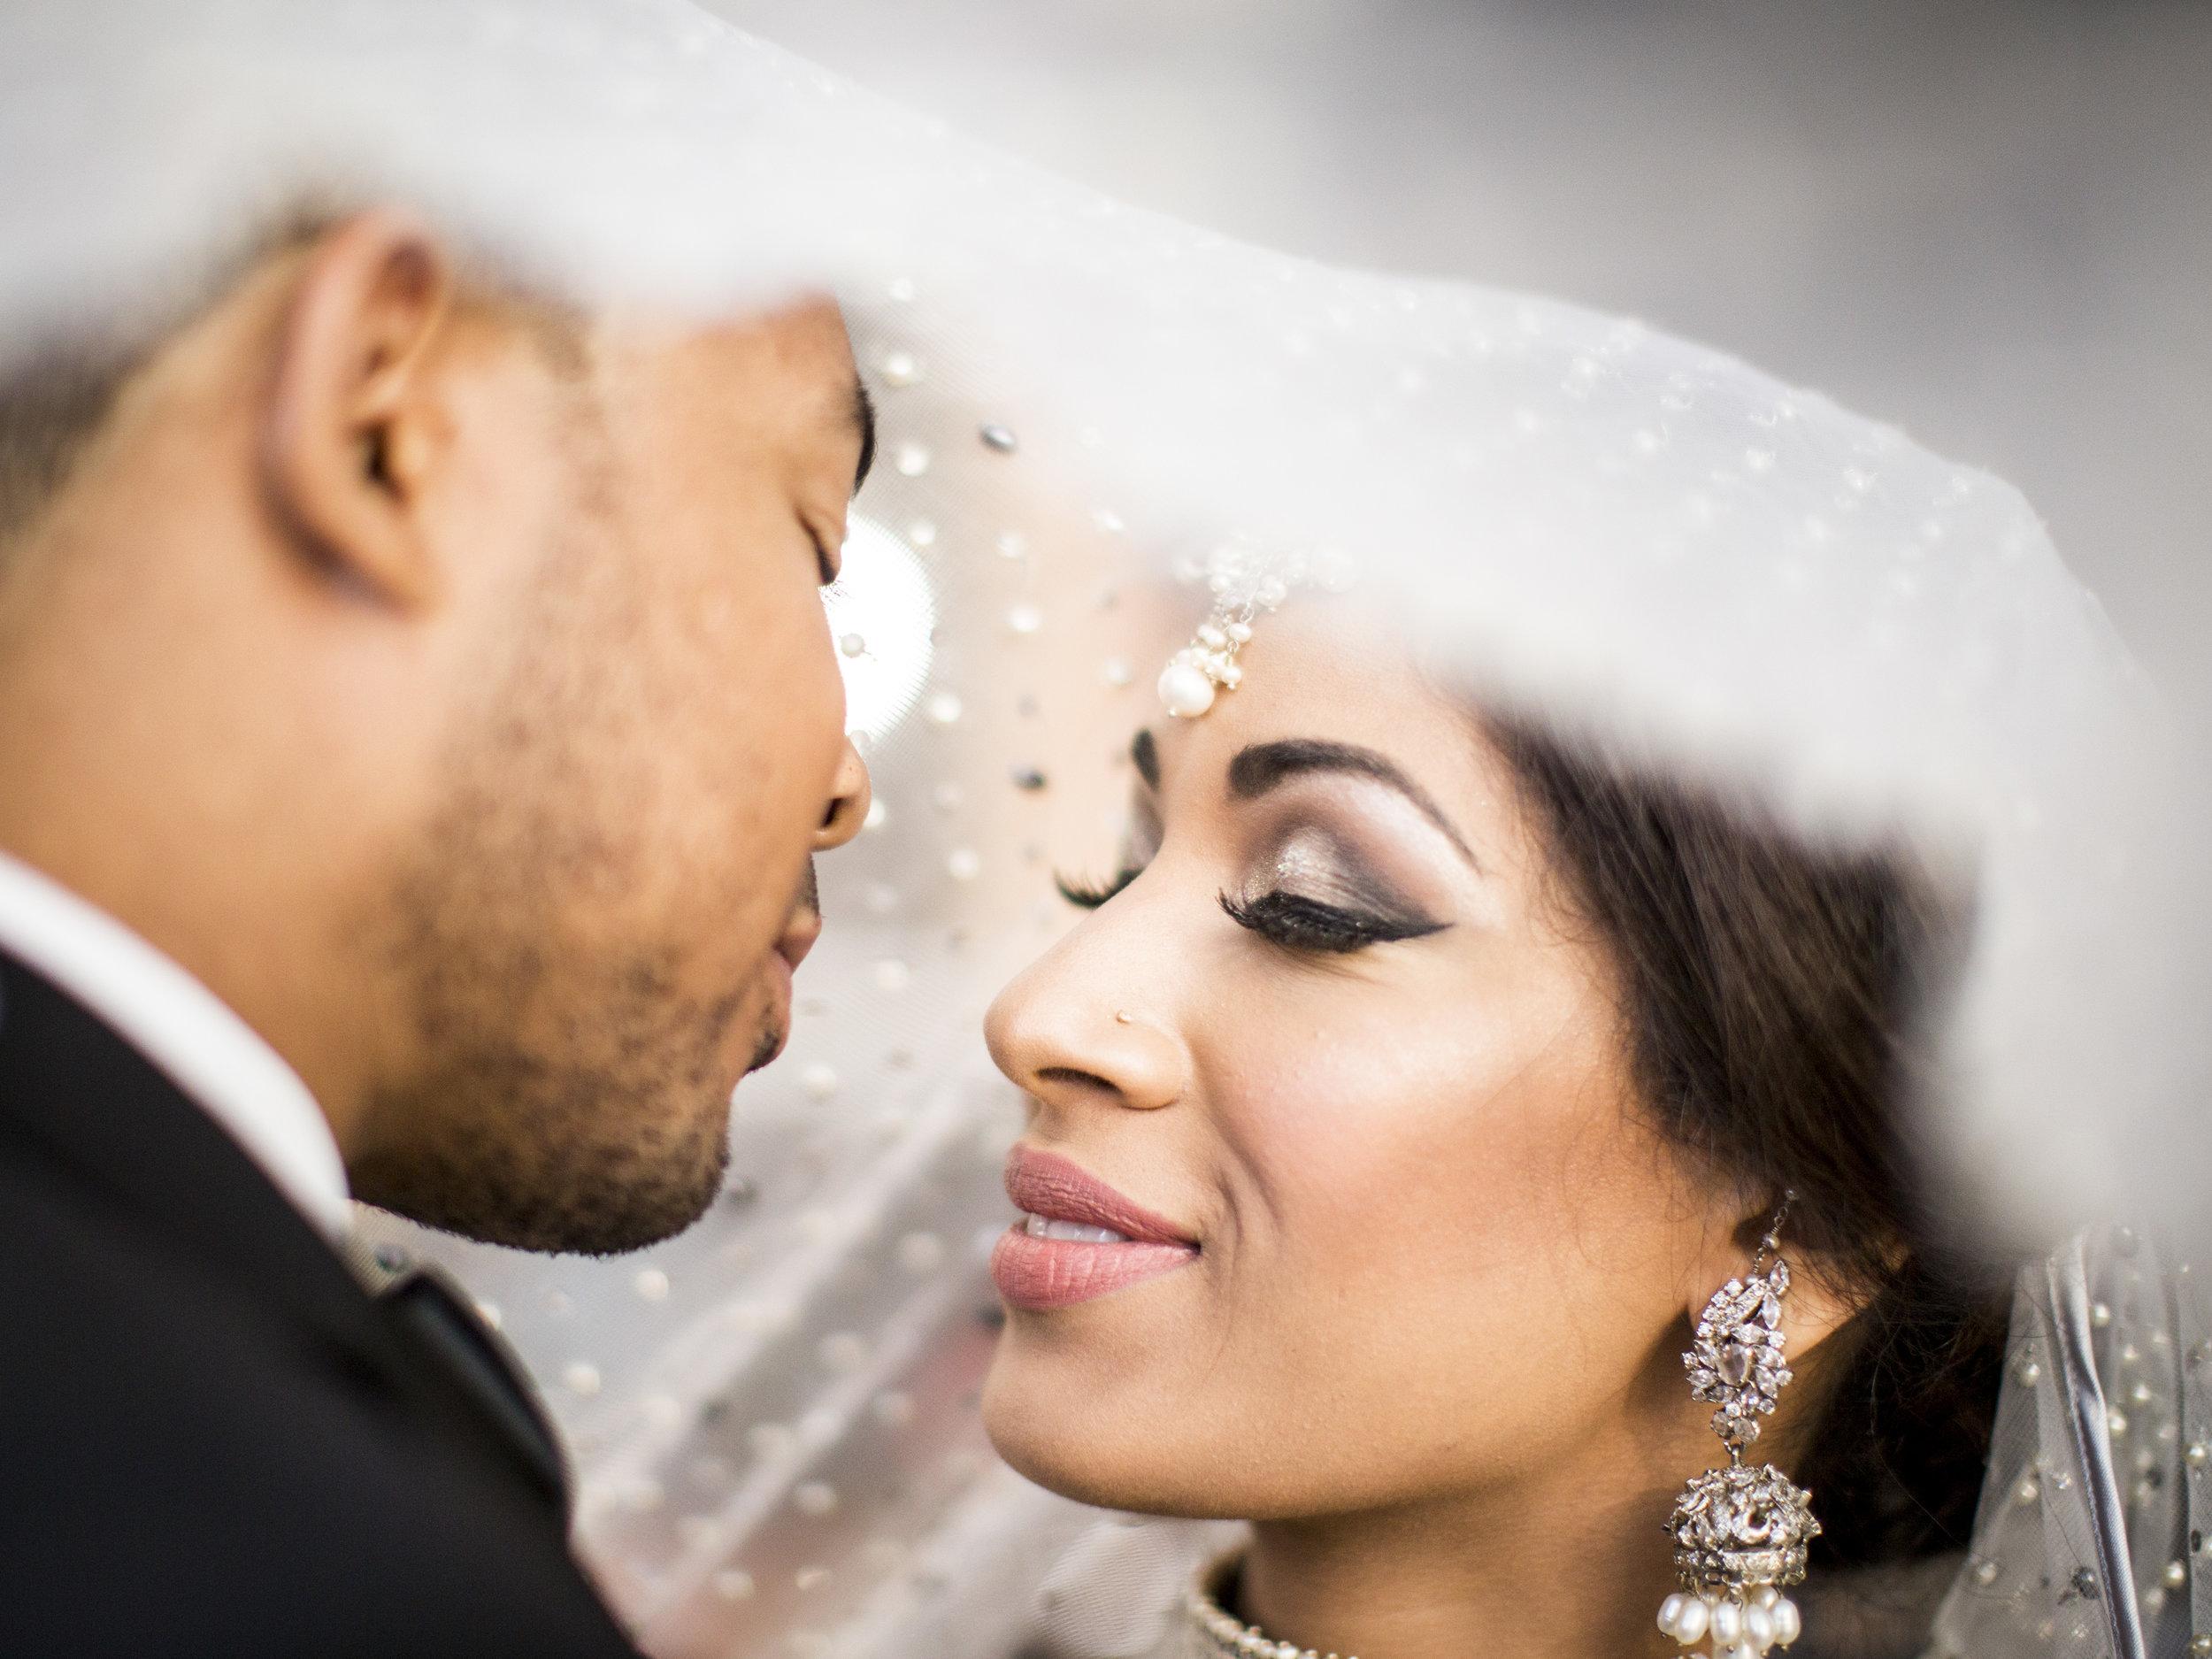 corradetti-glassblowing-studio-wedding-maryland-wedding-coordinator